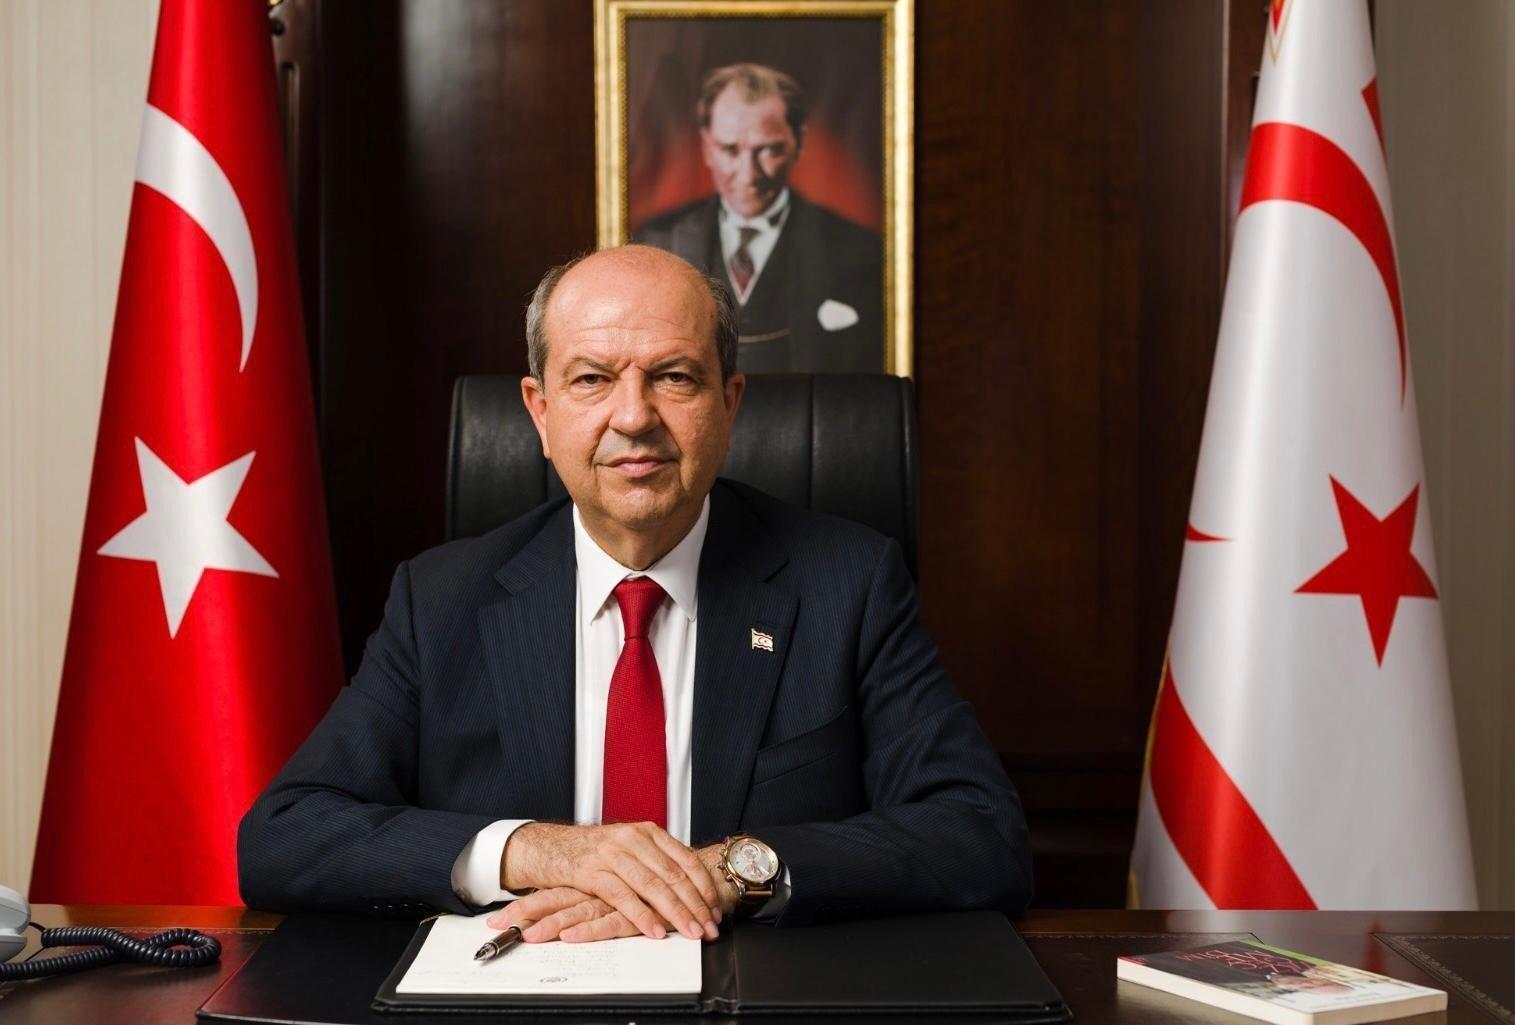 TRNC President Ersin Tatar, Lefkoşa (Nicosia), TRNC, May 14, 2021. (IHA Photo)